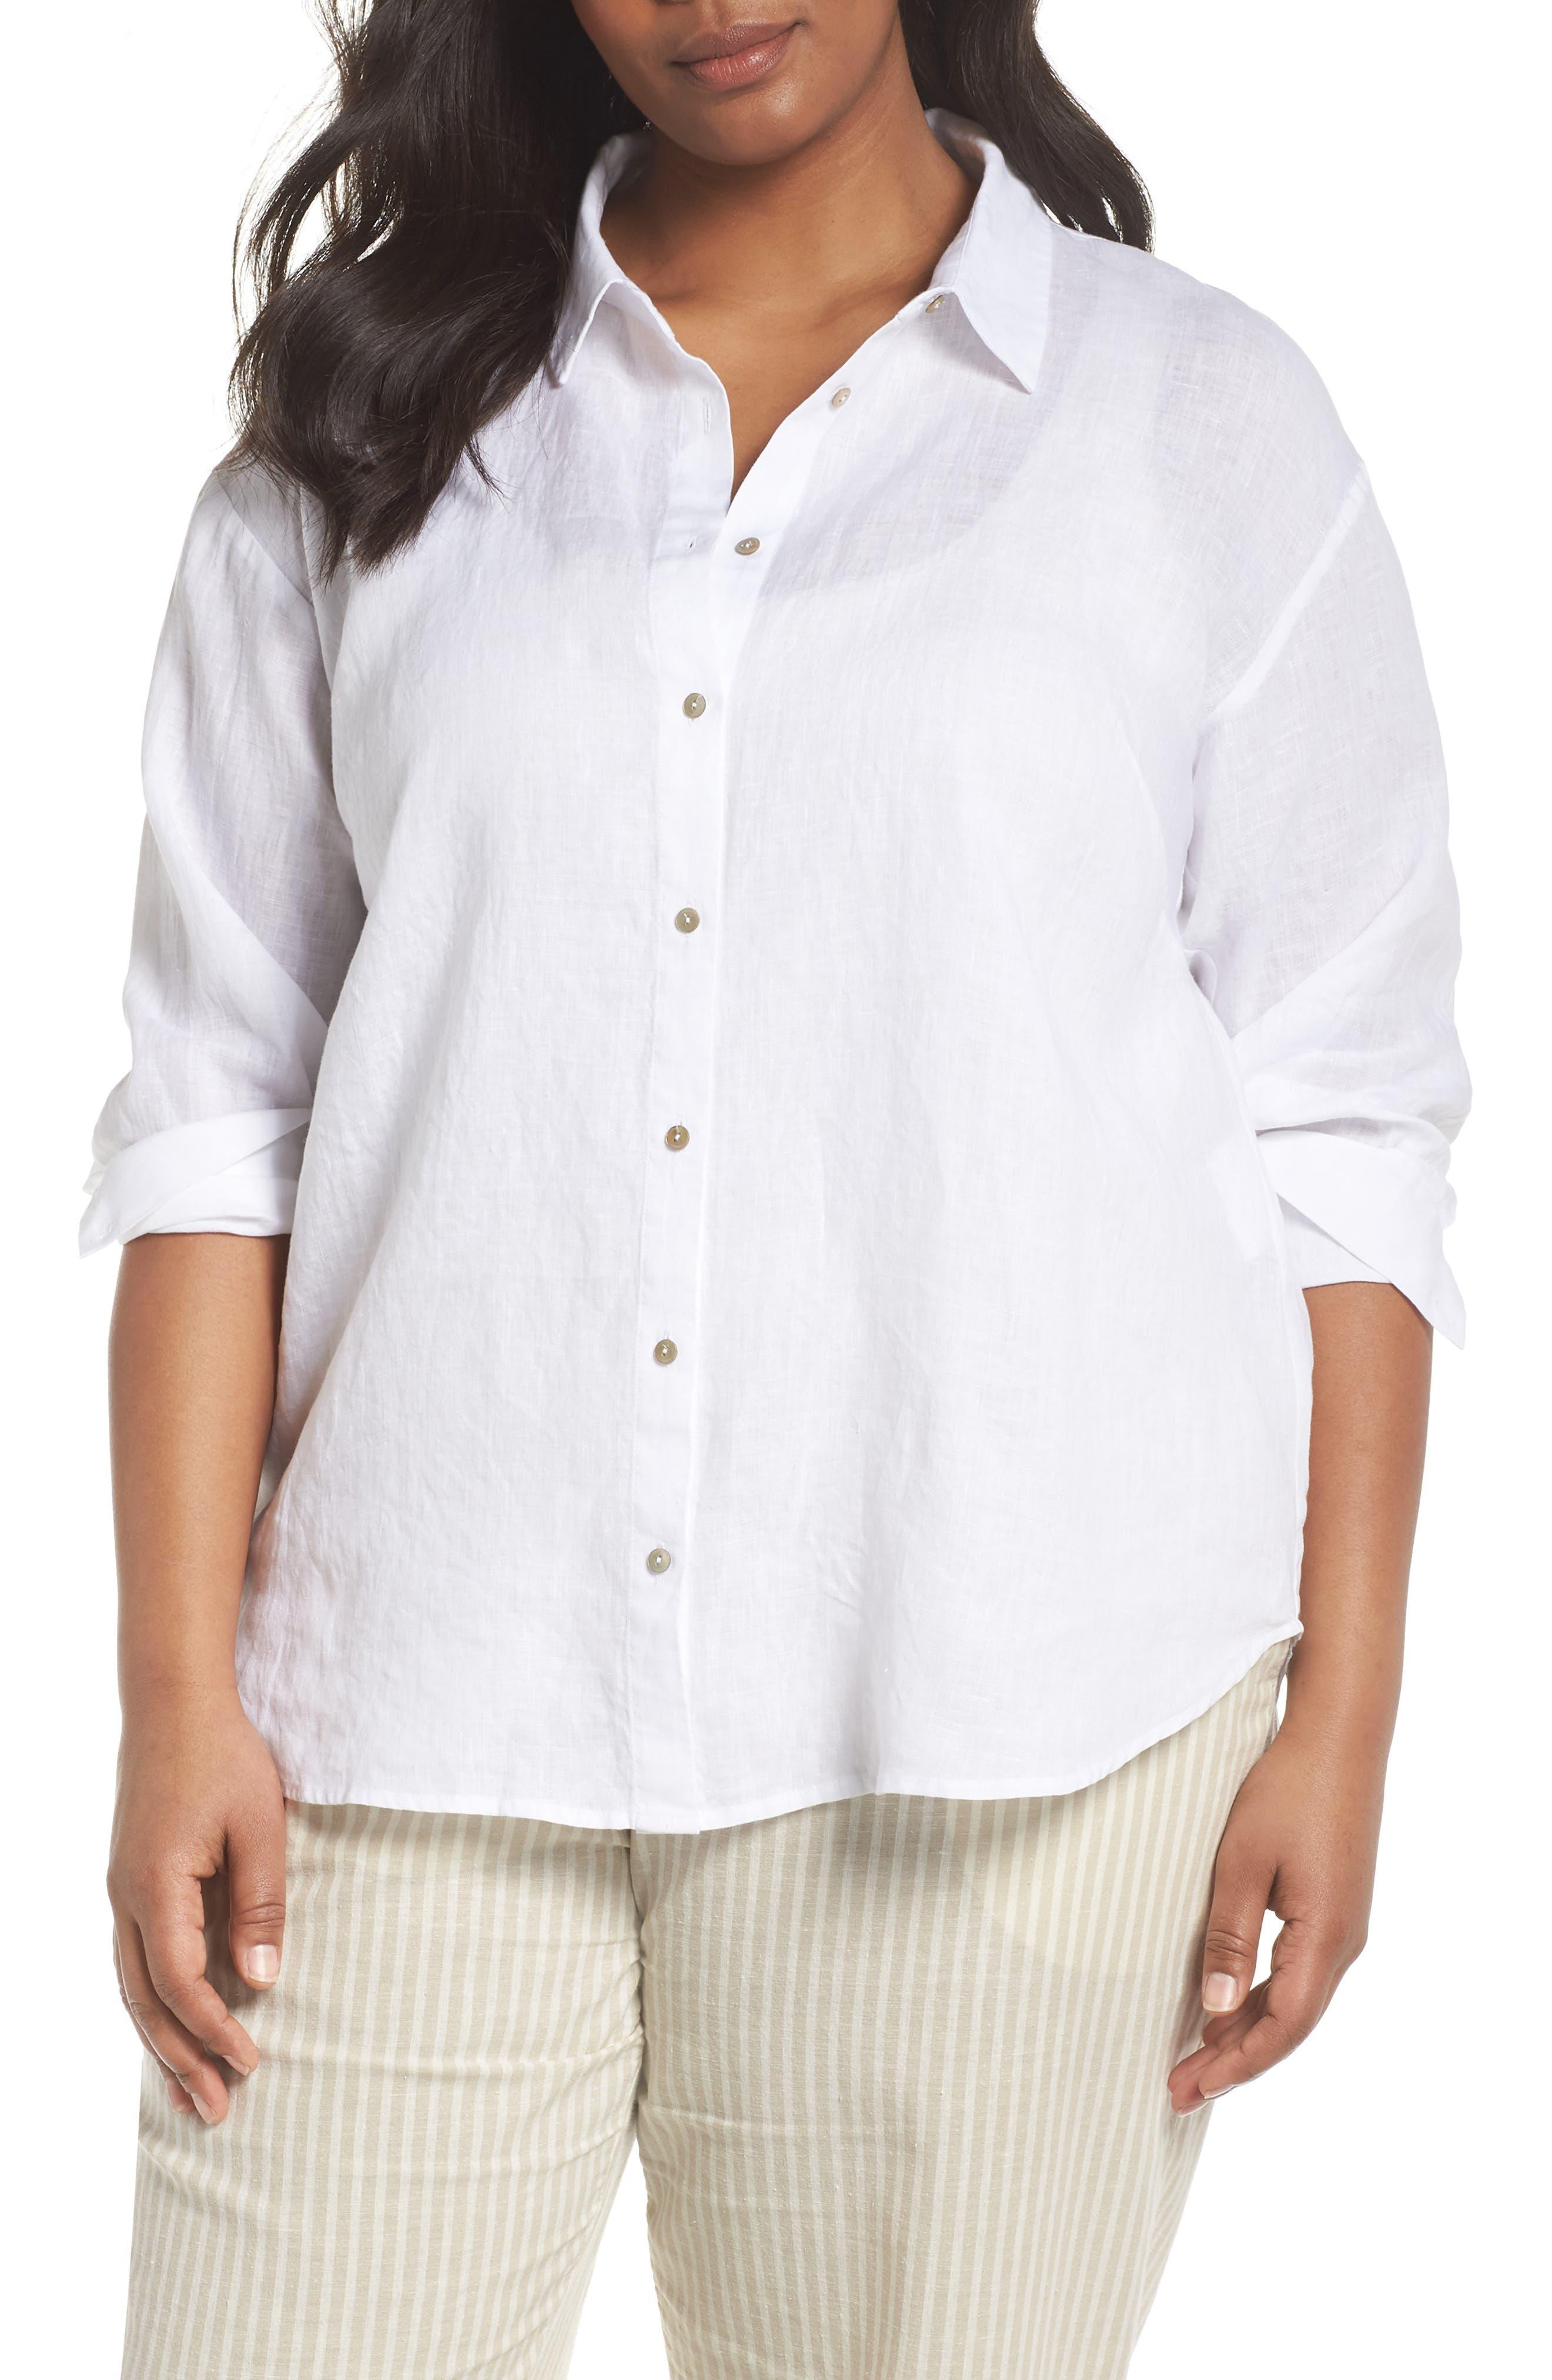 Organic Linen Shirt,                         Main,                         color, 100